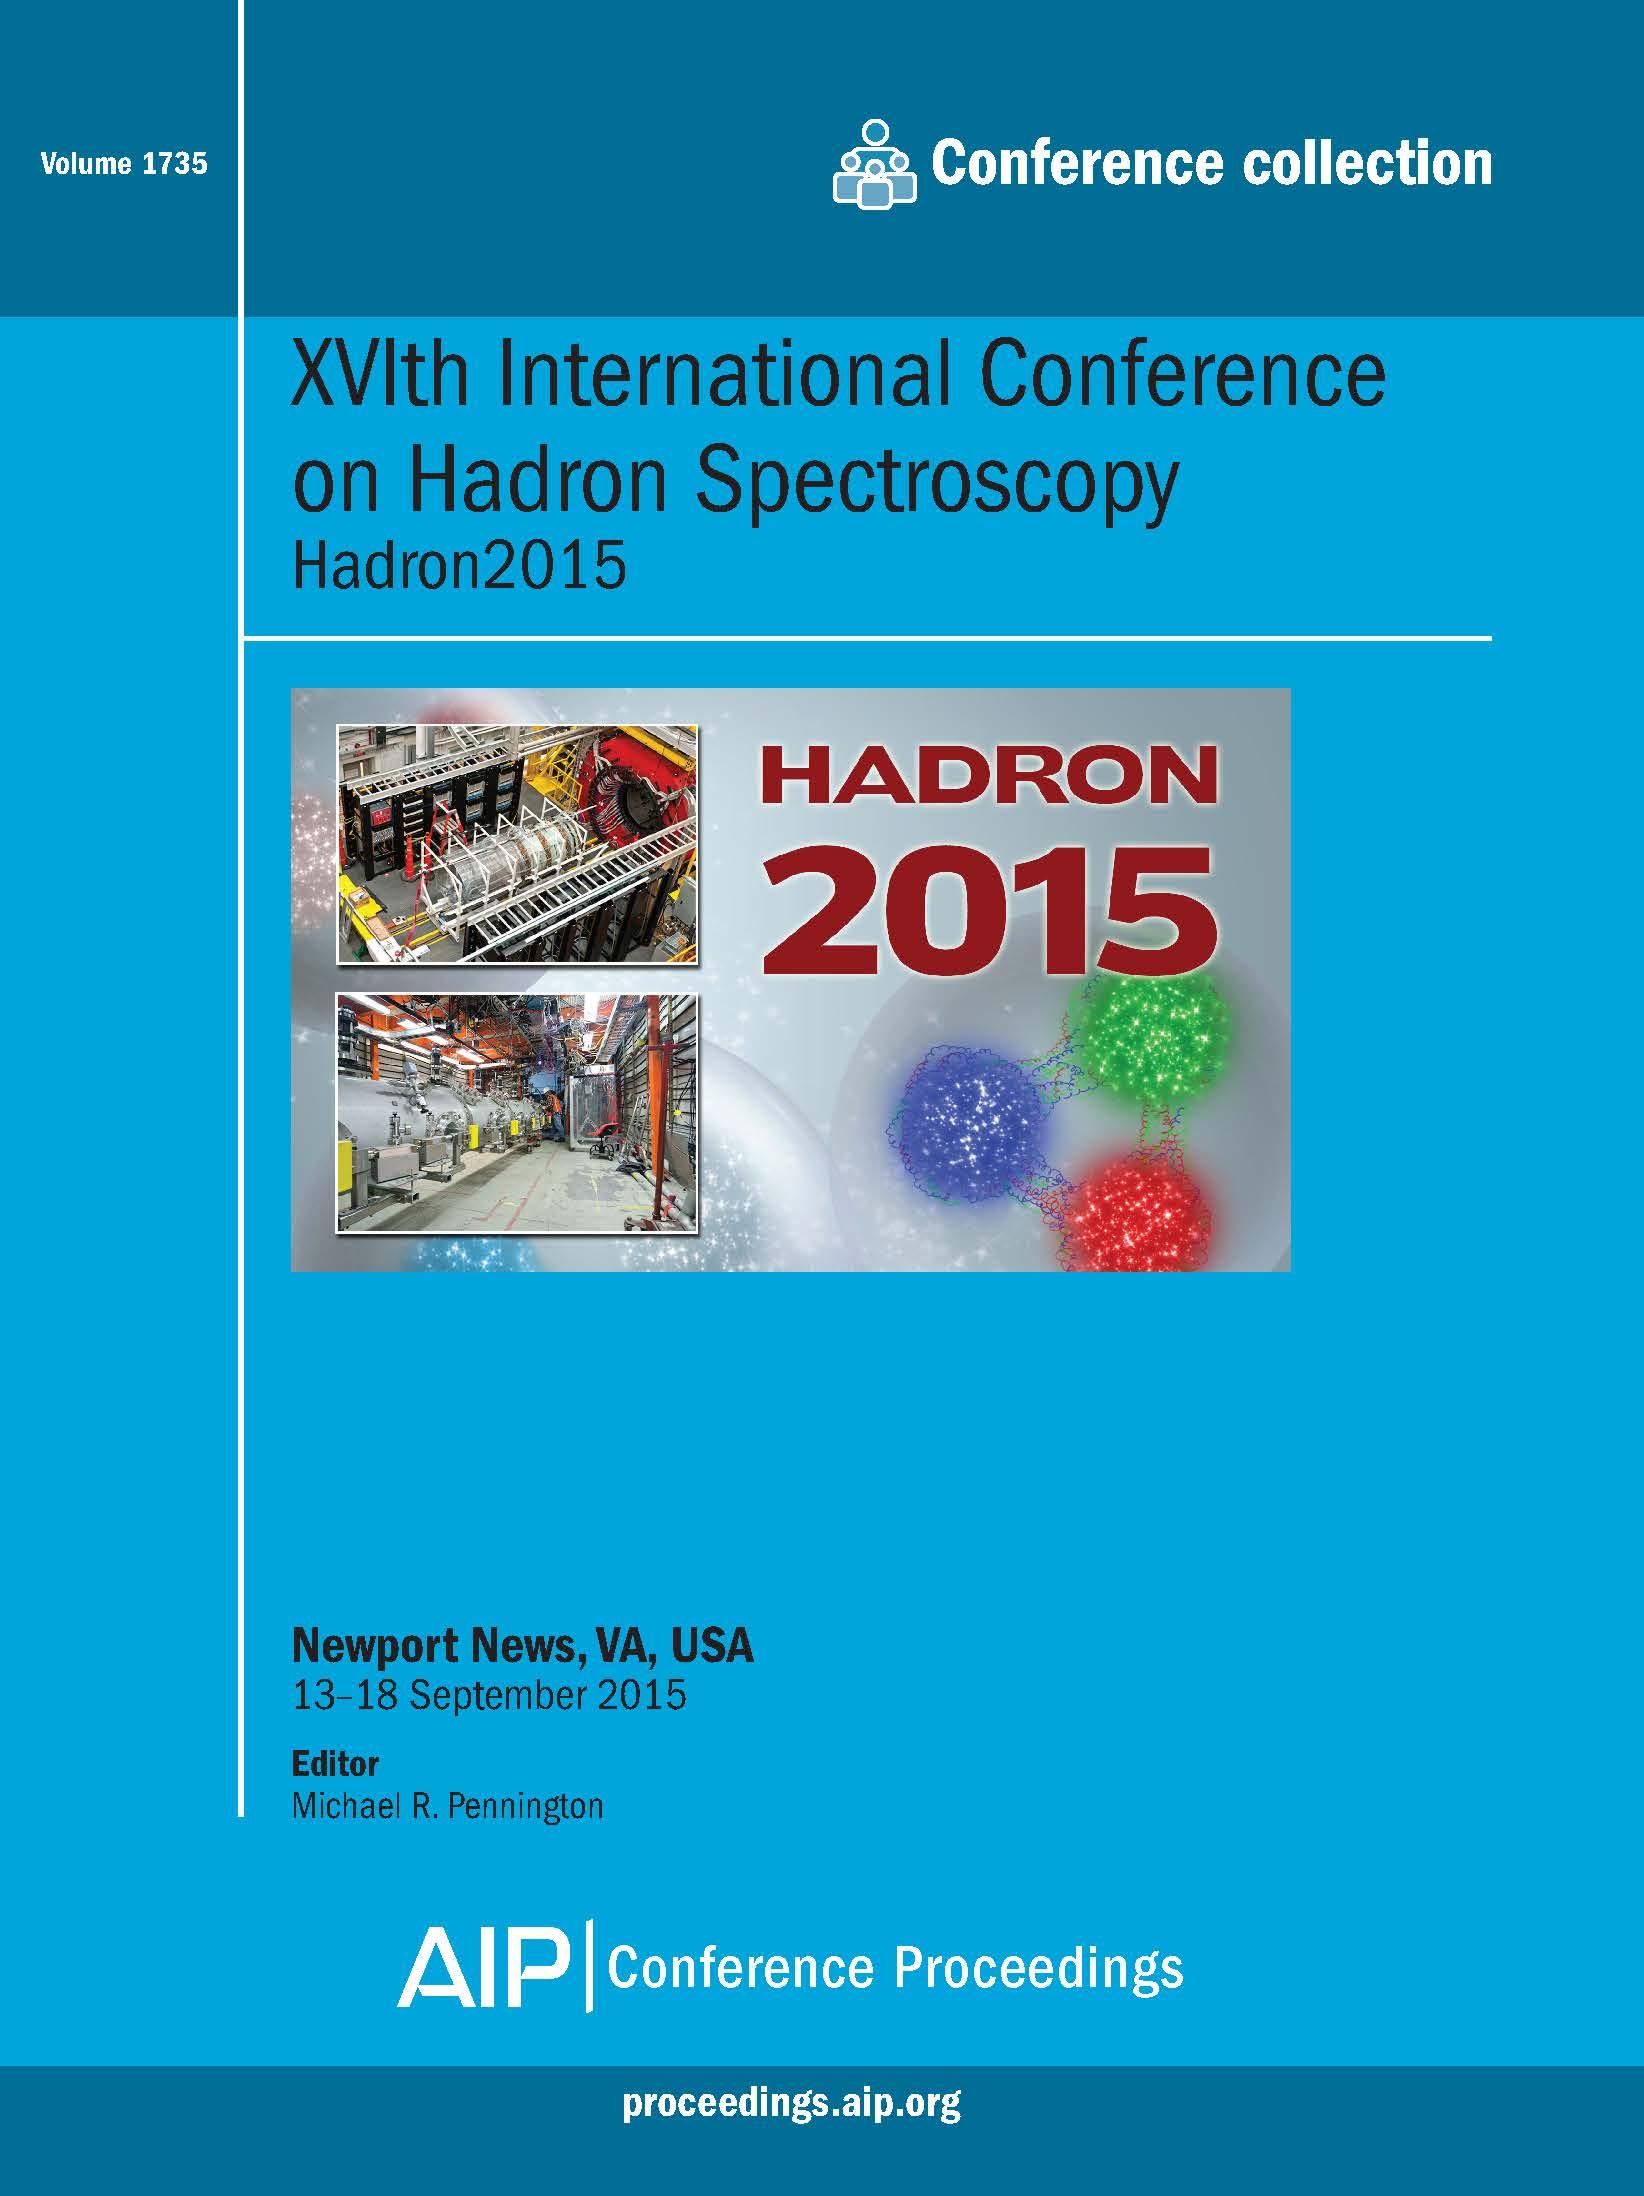 Volume 1735: XVIth International Conference on Hadron Specroscopy